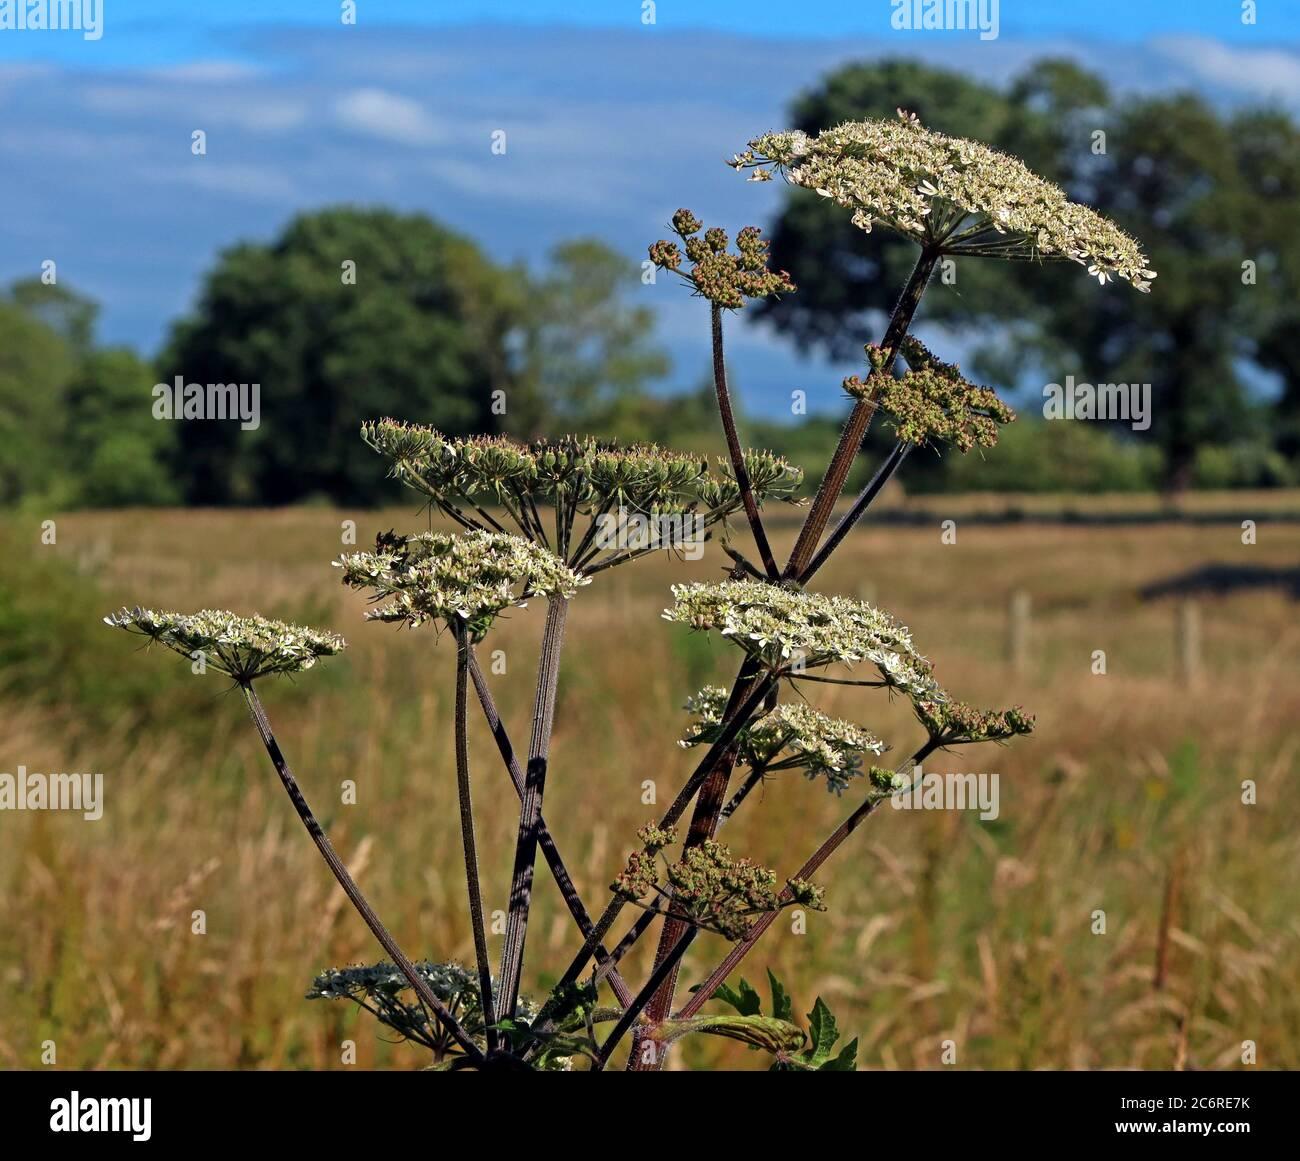 GoTonySmith,HotpixUK,@HotpixUK,England,UK,weed,farming,macro,summer,alien,invasive species,alien plant,plant,vegetation,plants,weeds,Anthriscus,sylvestris